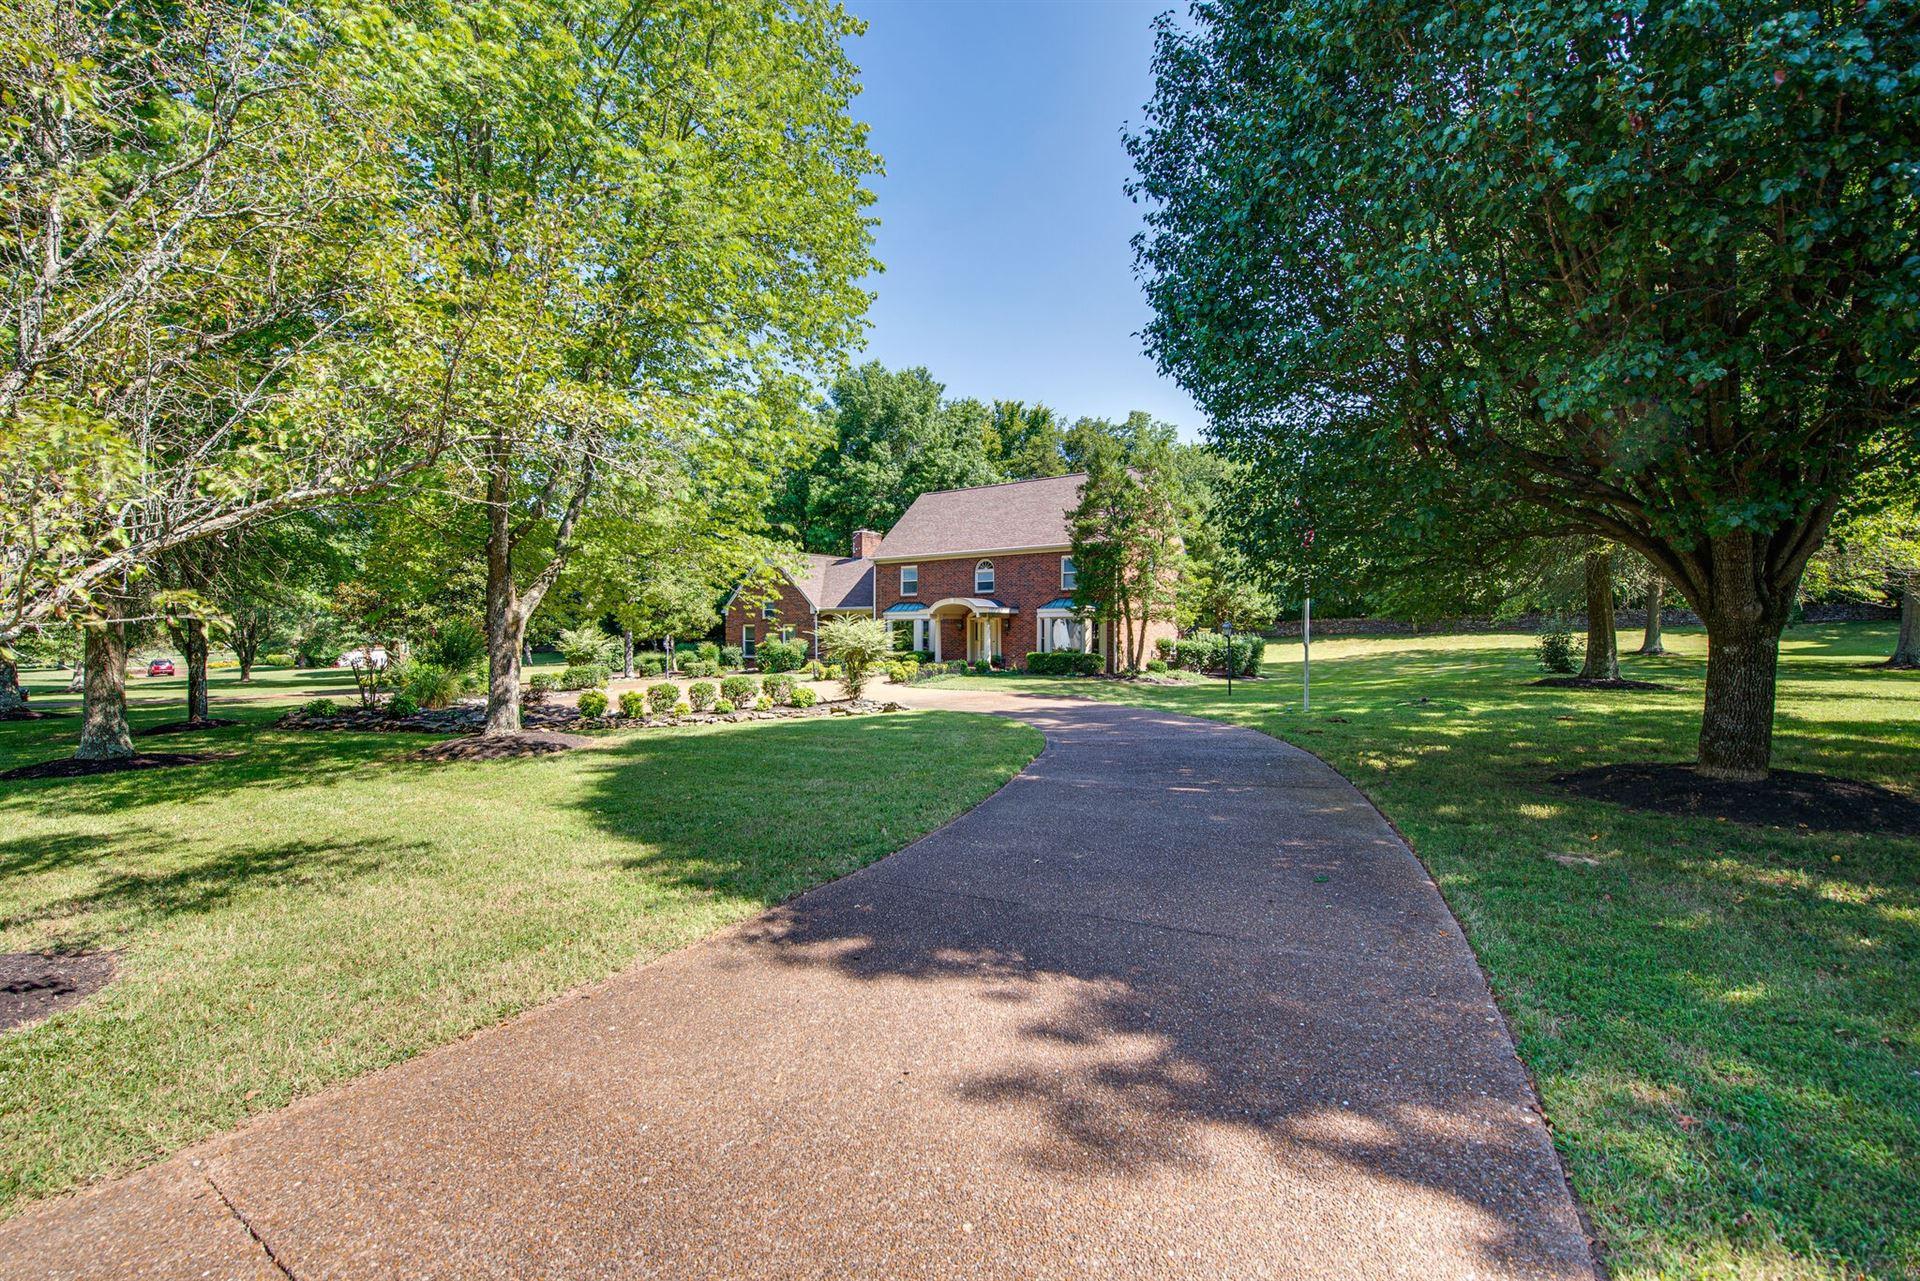 Photo of 1156 Hidden Valley Rd, Brentwood, TN 37027 (MLS # 2274759)